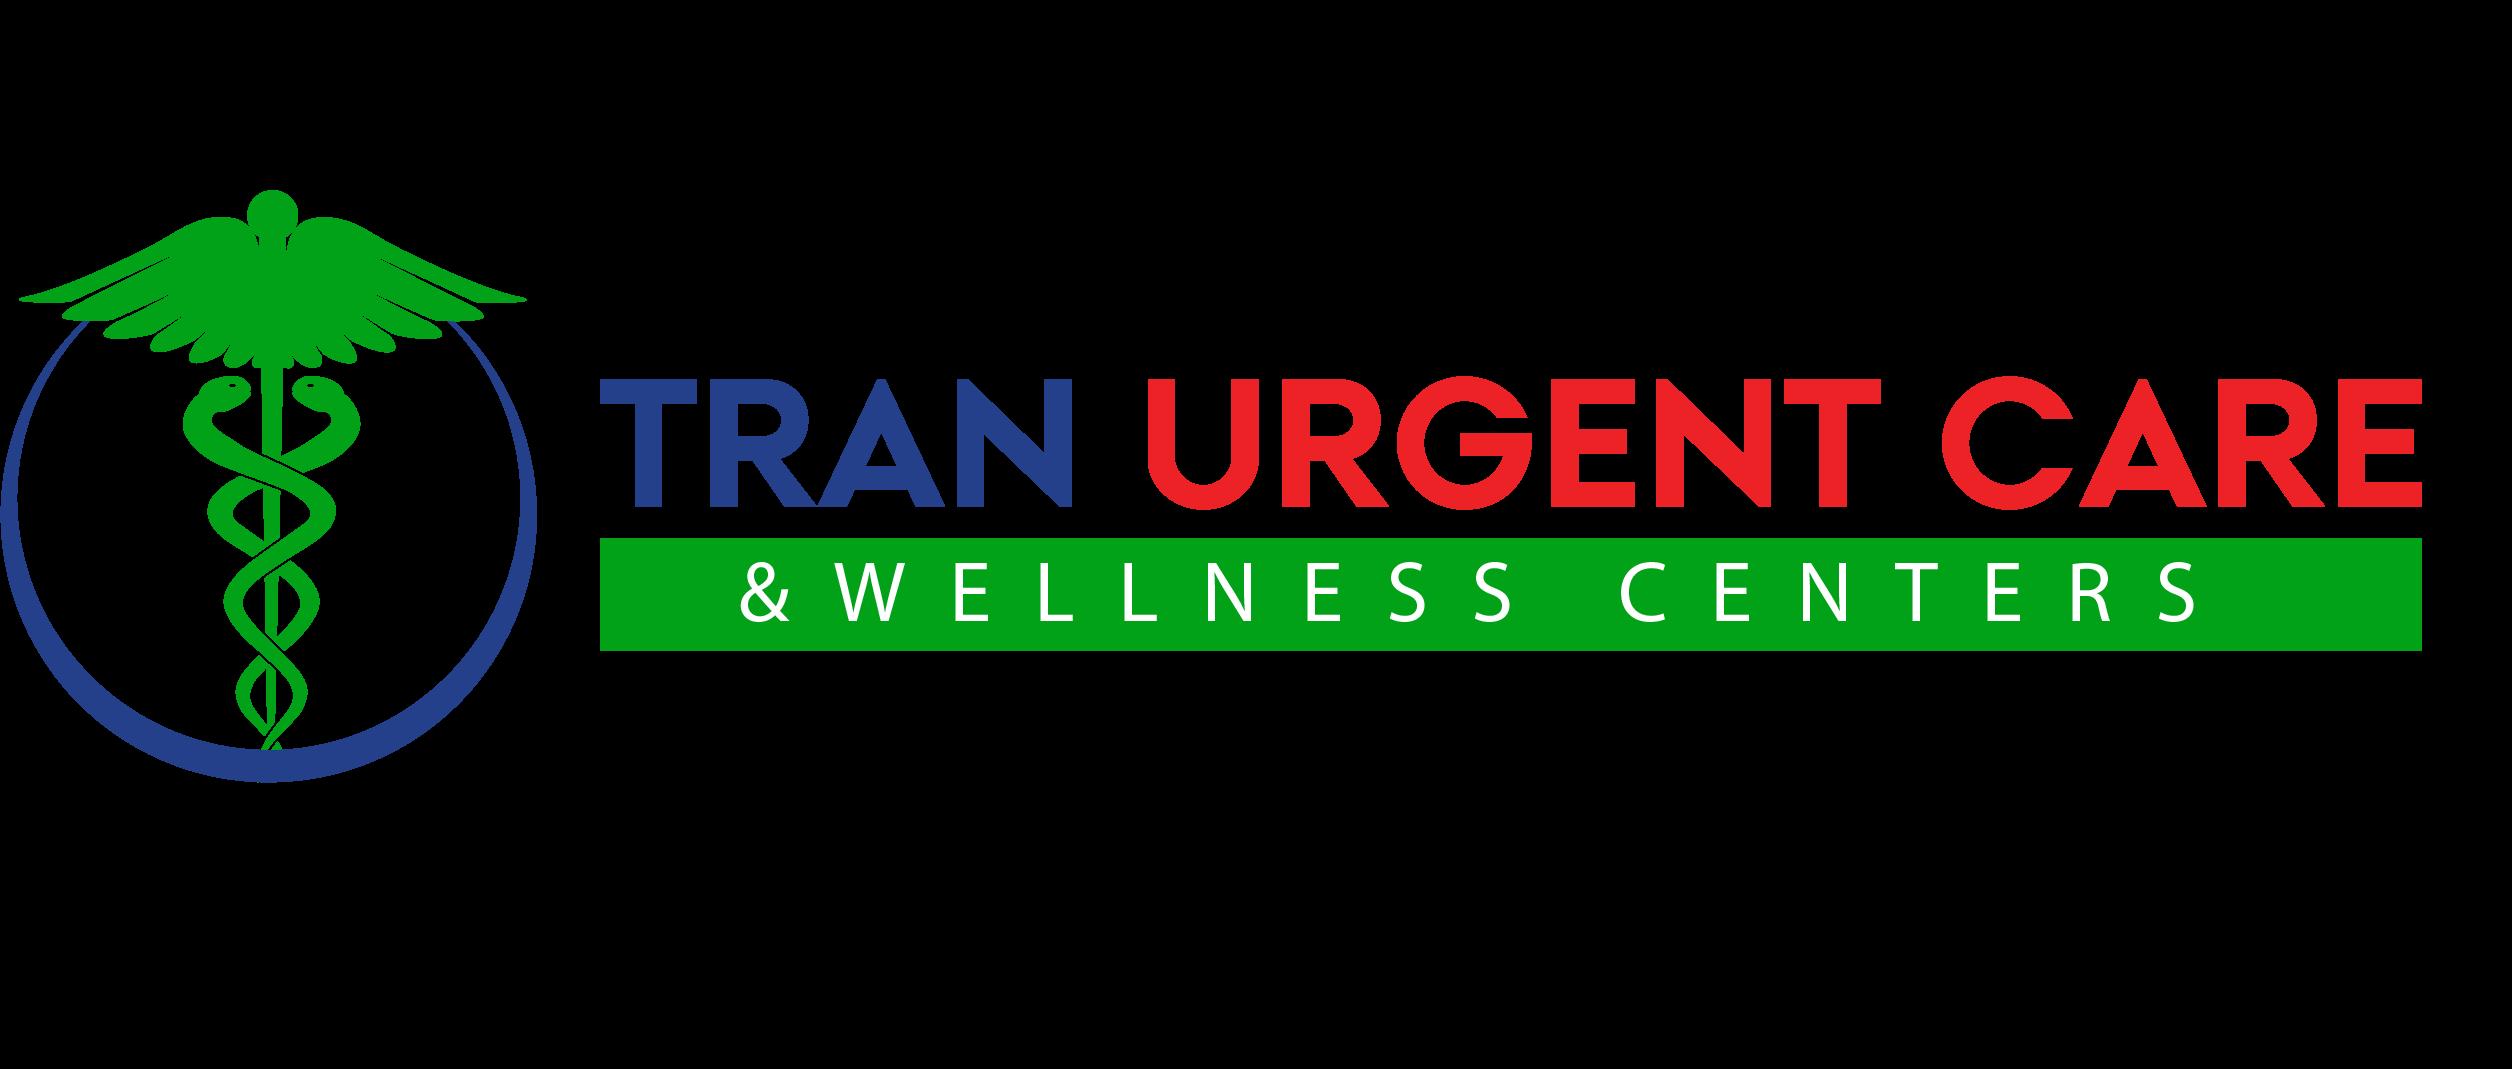 Tran Urgent Care & Wellness Center - Northwest Olympia Logo